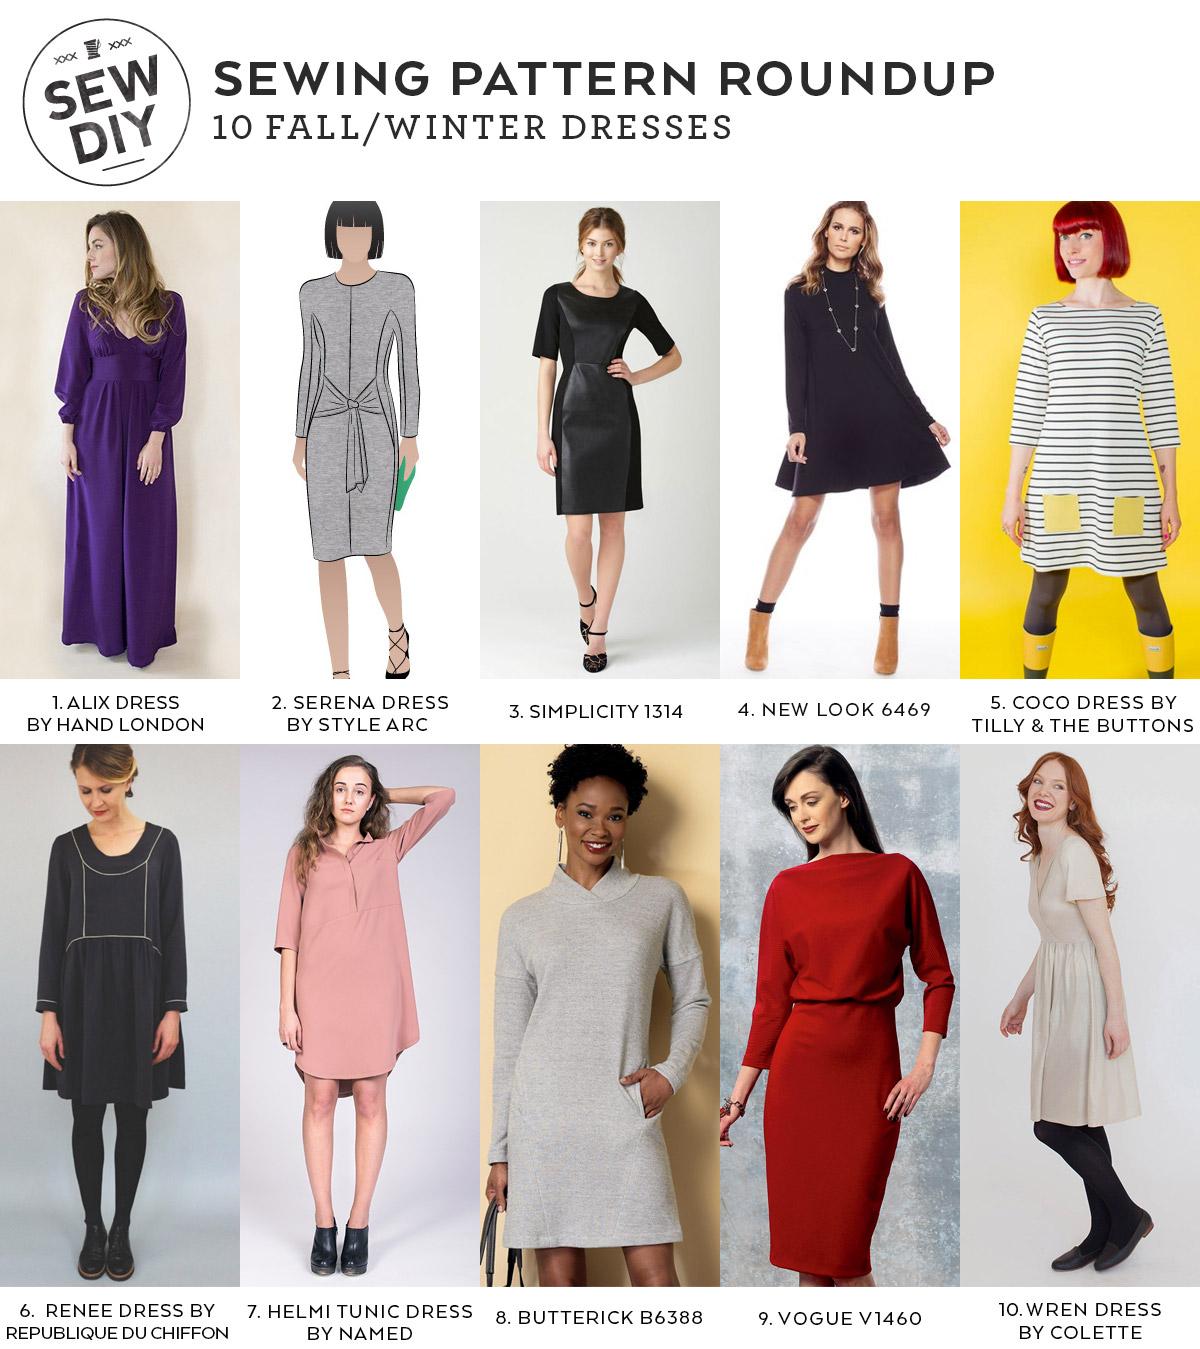 b3029a57c977e 10 Fall/Winter Dresses – Sewing Pattern Roundup — Sew DIY